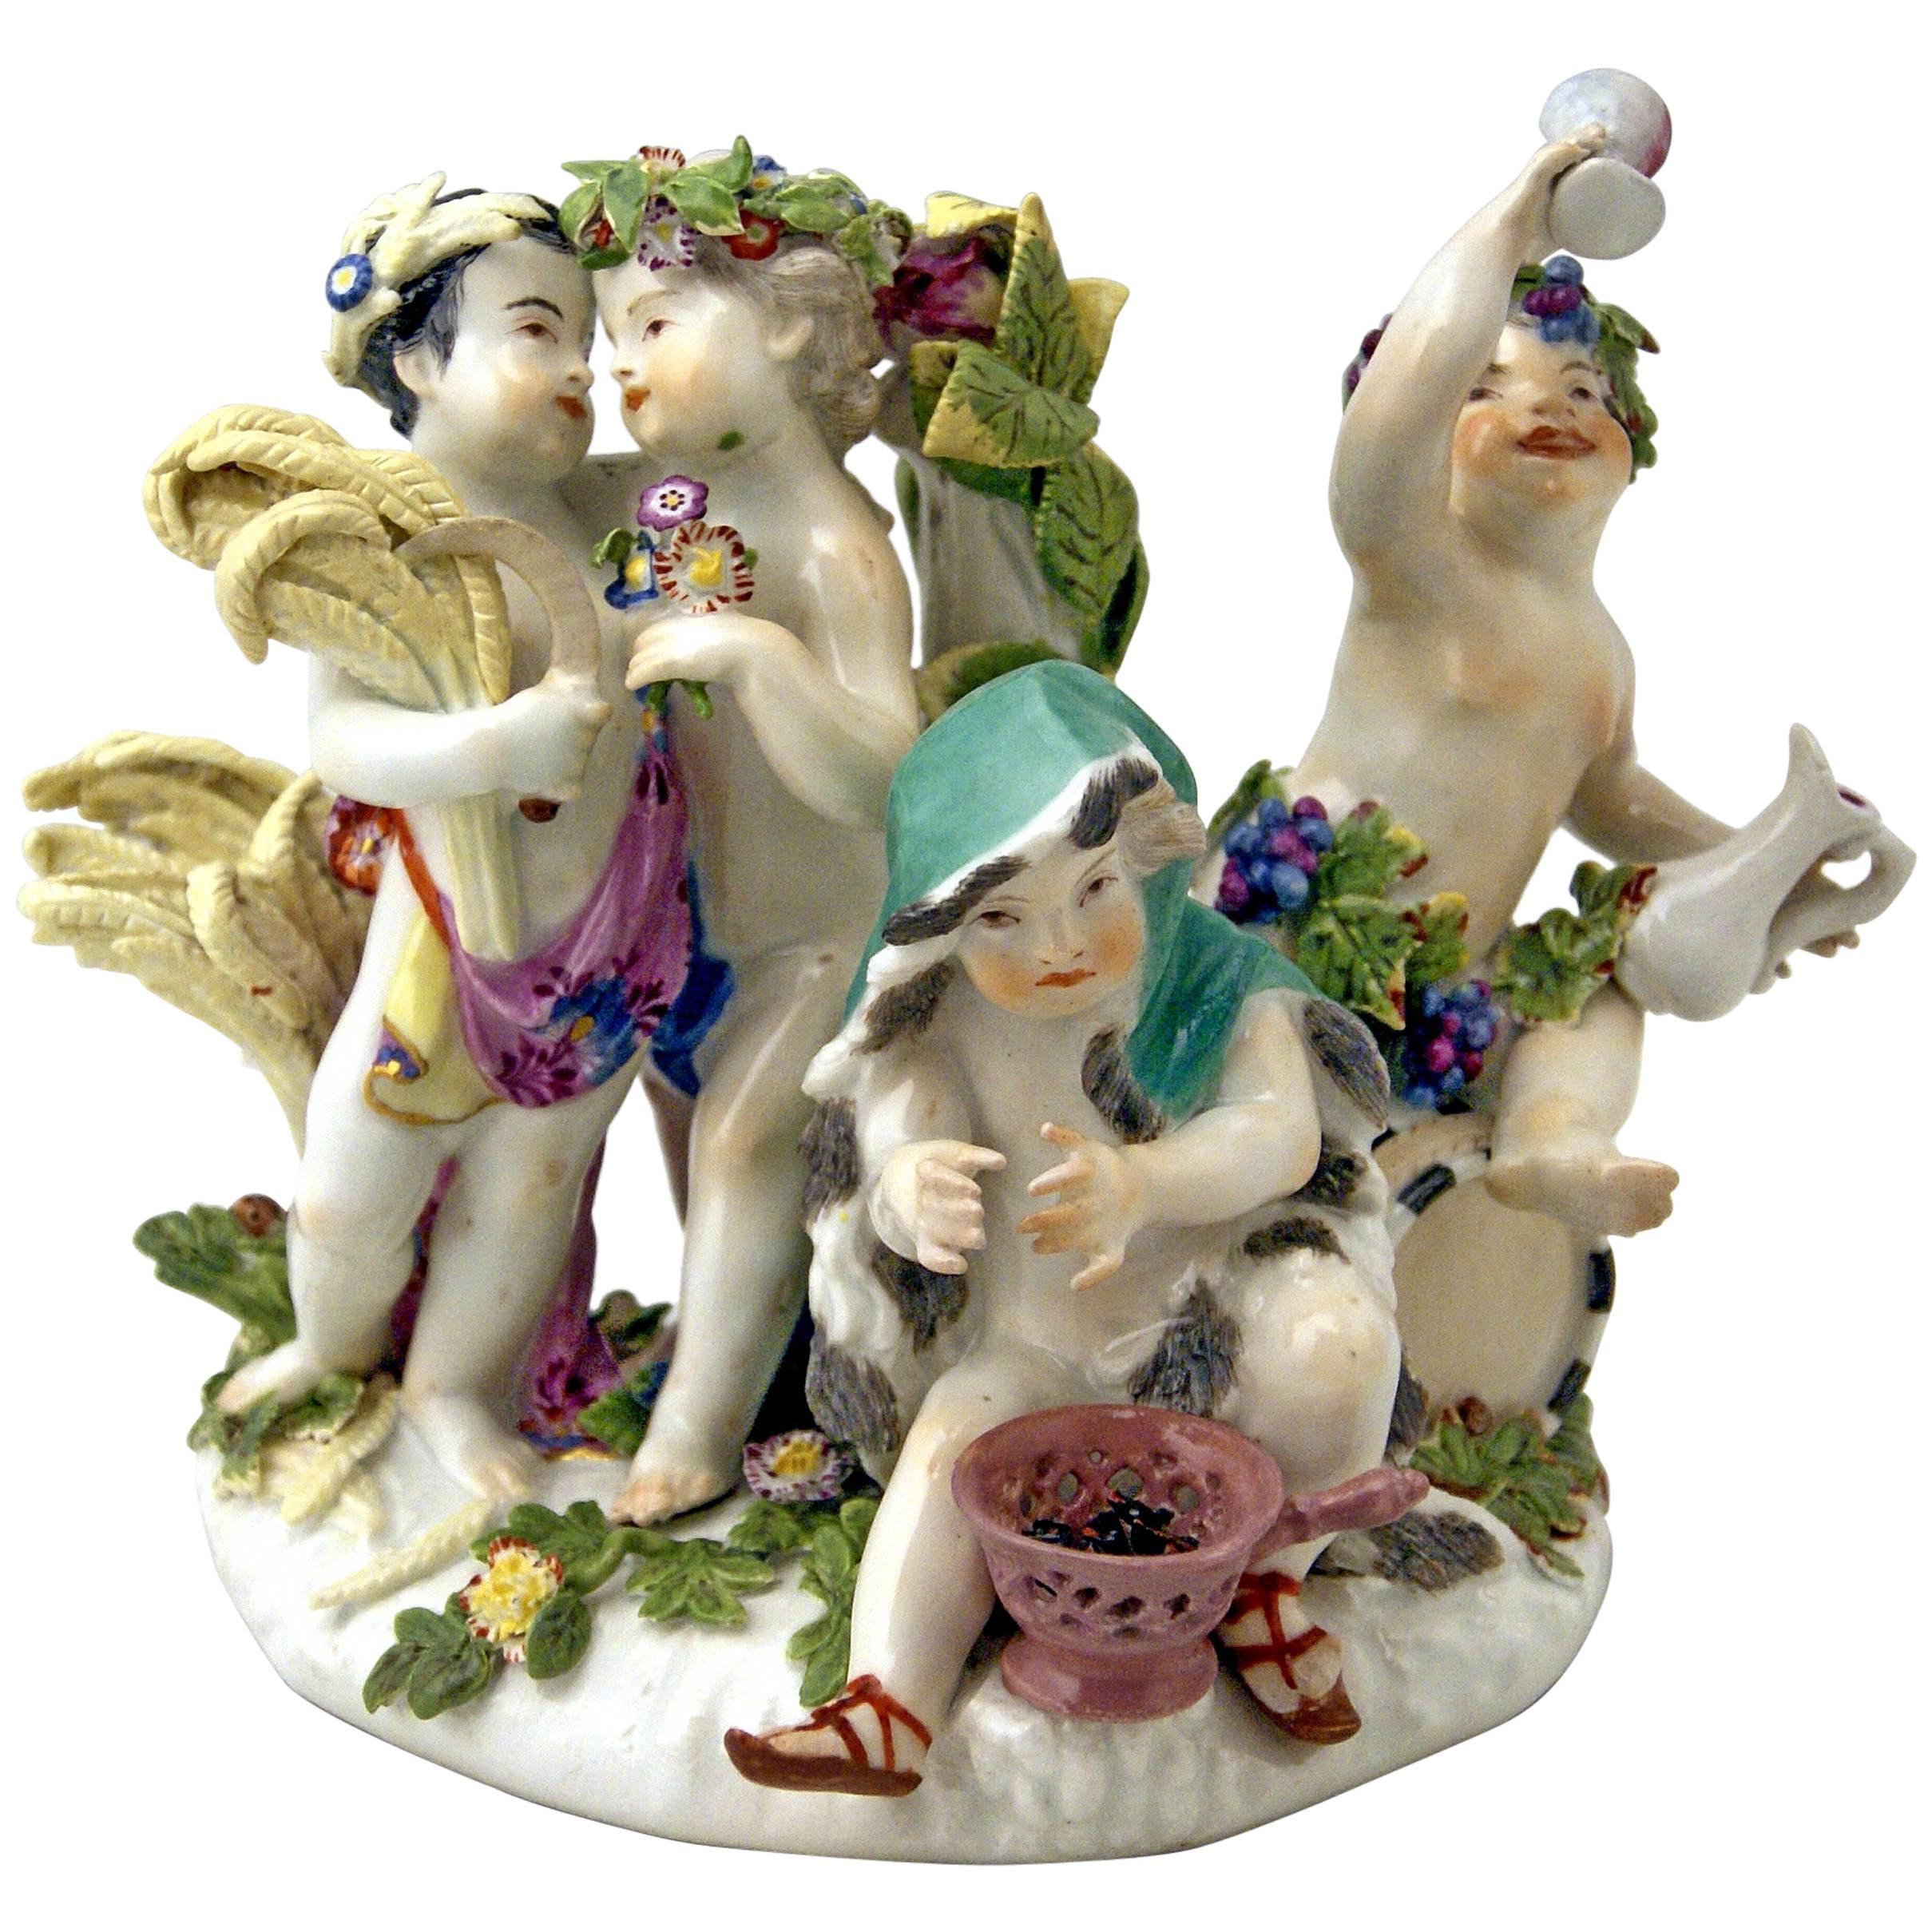 Meissen Gorgeous Figurine Group the Four Seasons Cherubs by Kaendler c. 1755-60